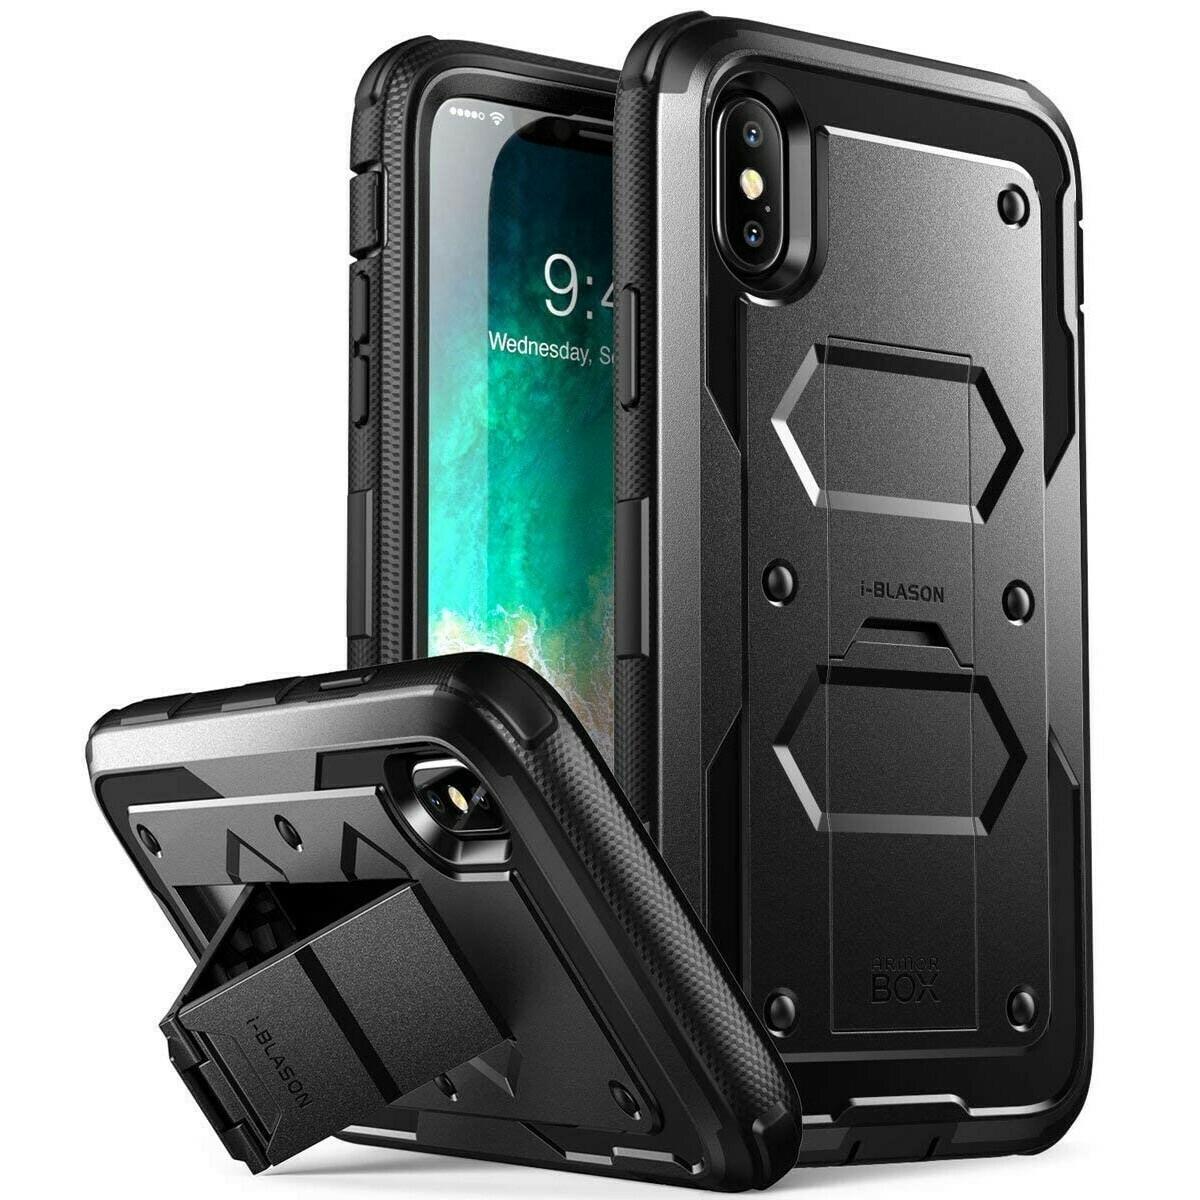 Case IPhone X / IPhone Xs Recio Protector 360 c/ Parante c/ Gancho c/ Mica